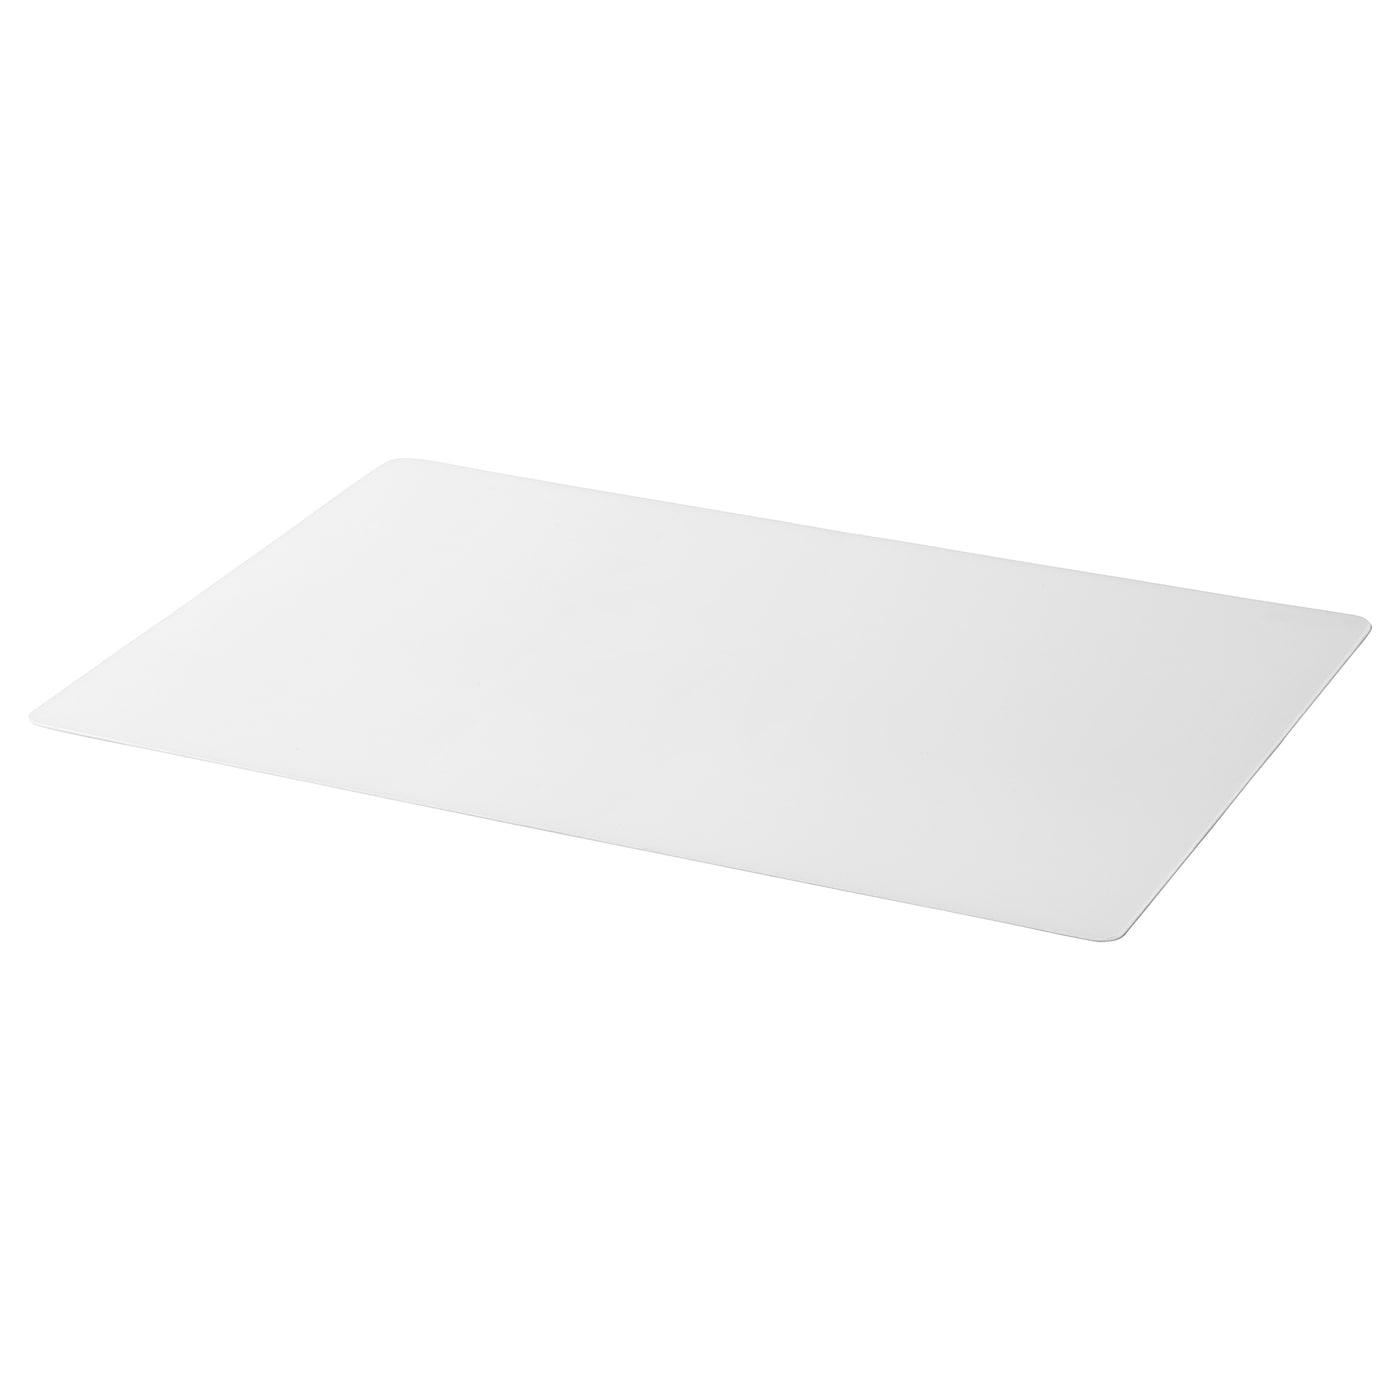 Micke escritorio blanco 142 x 50 cm ikea - Protector de escritorio ...